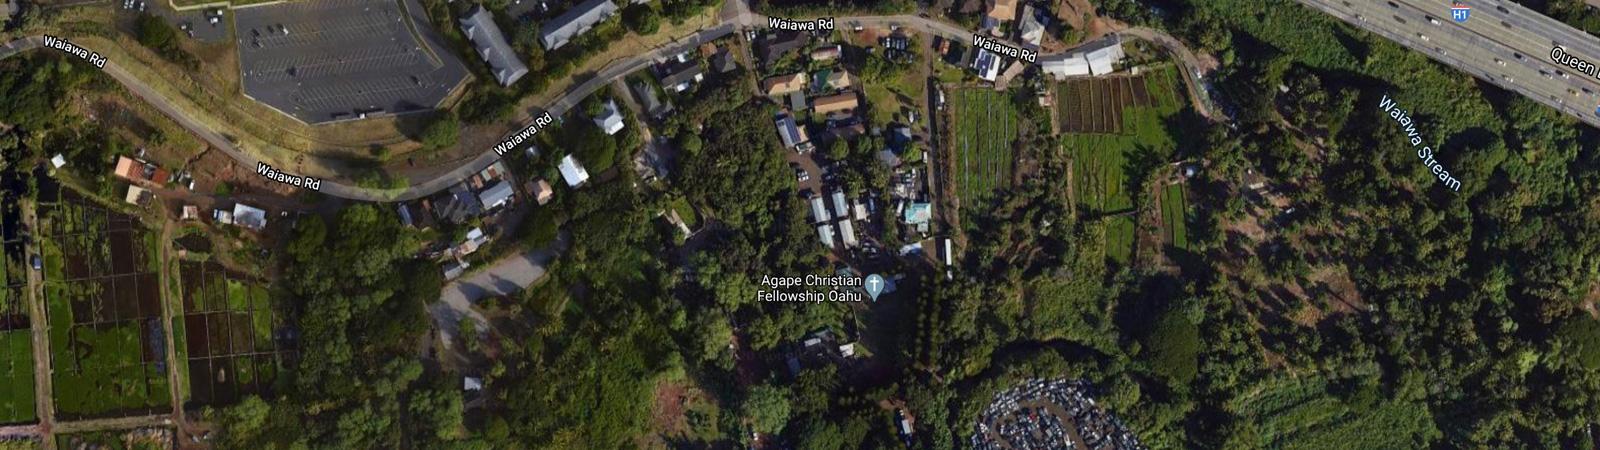 Agape Christian Fellowship Oahu Map